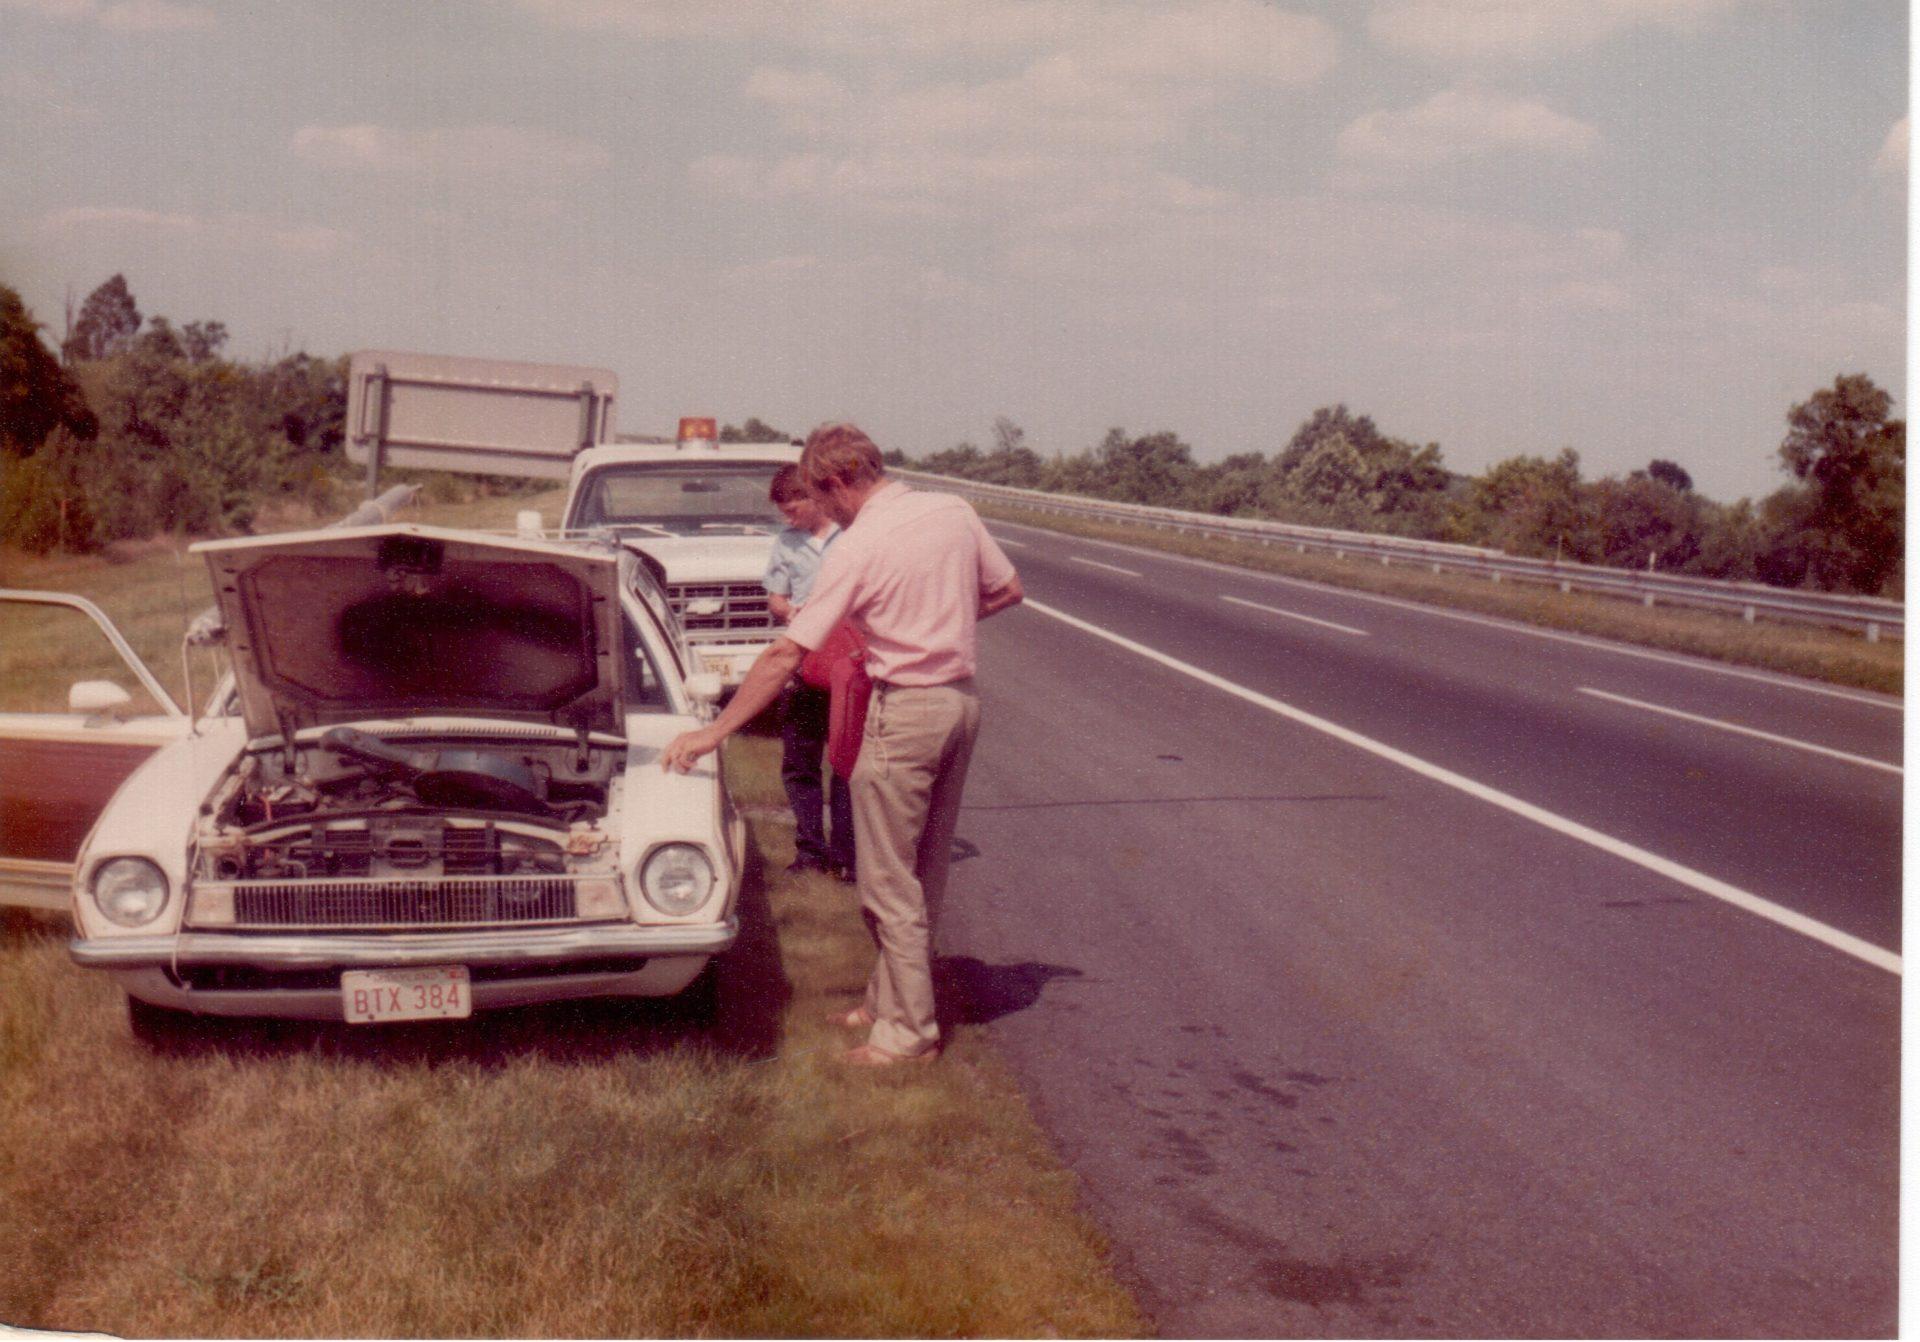 New Jersey Turnpike 1979